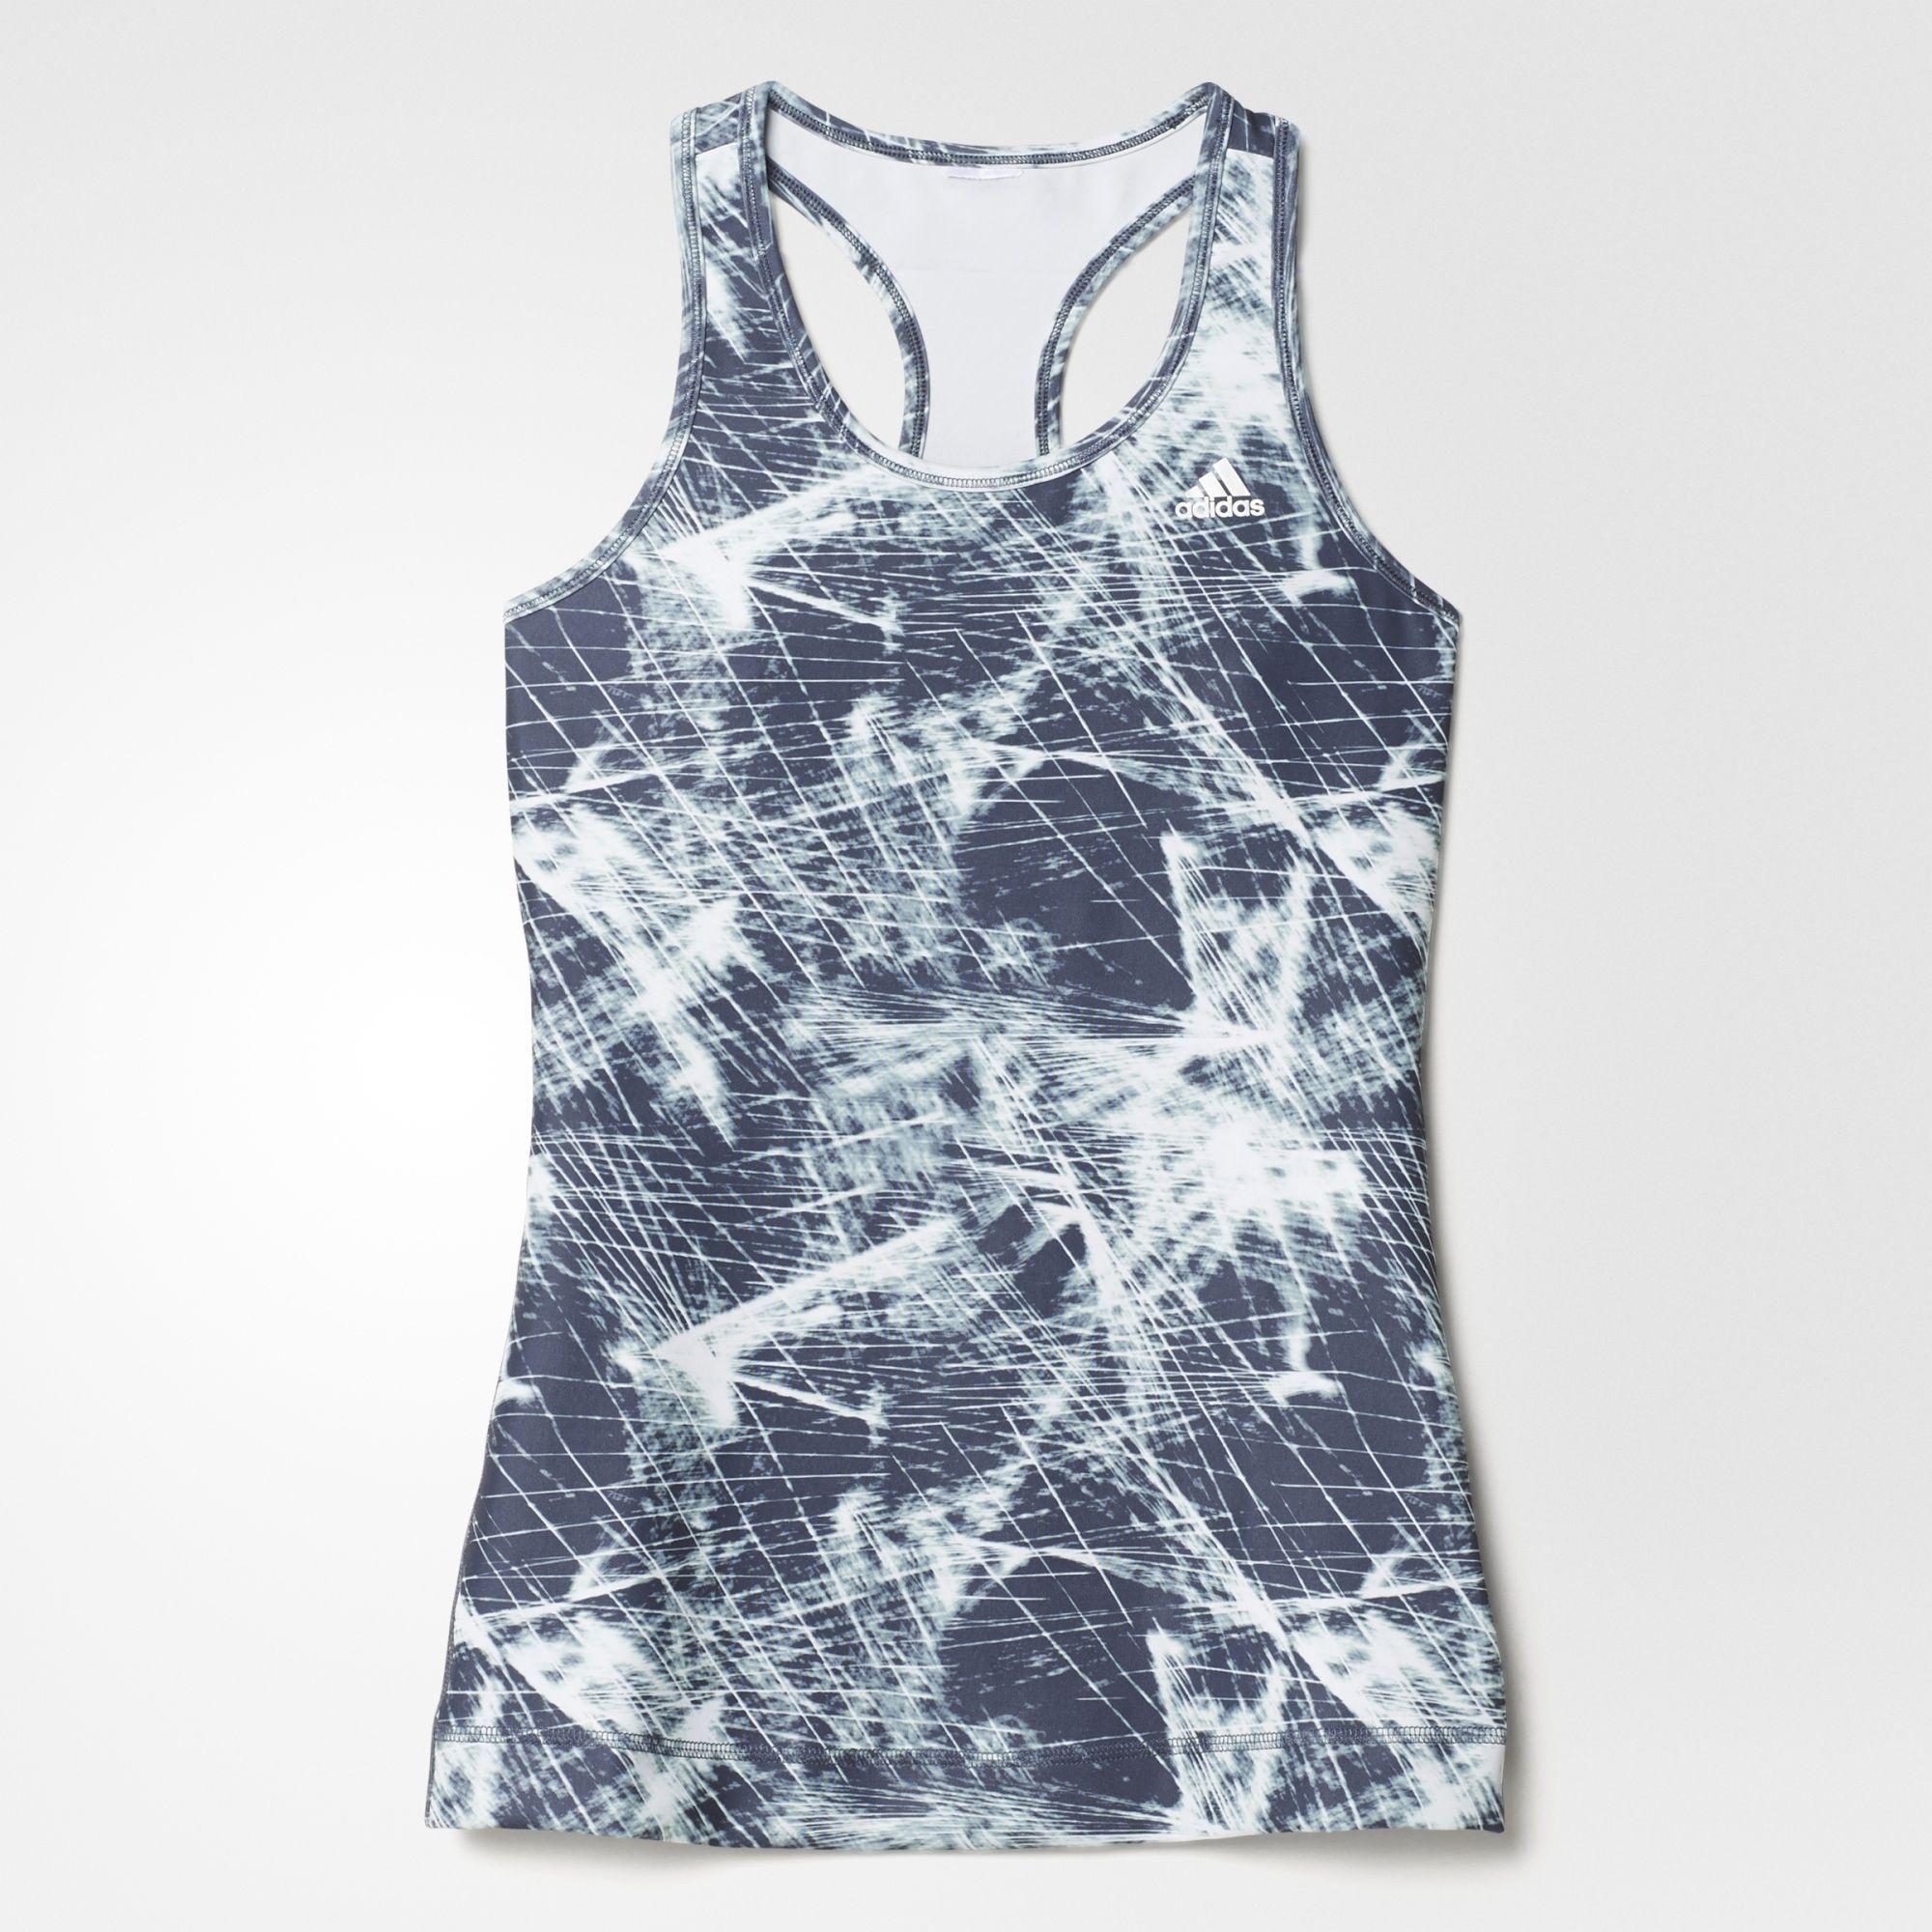 adidas Techfit Solid Tank Women's   Gym Tank Top